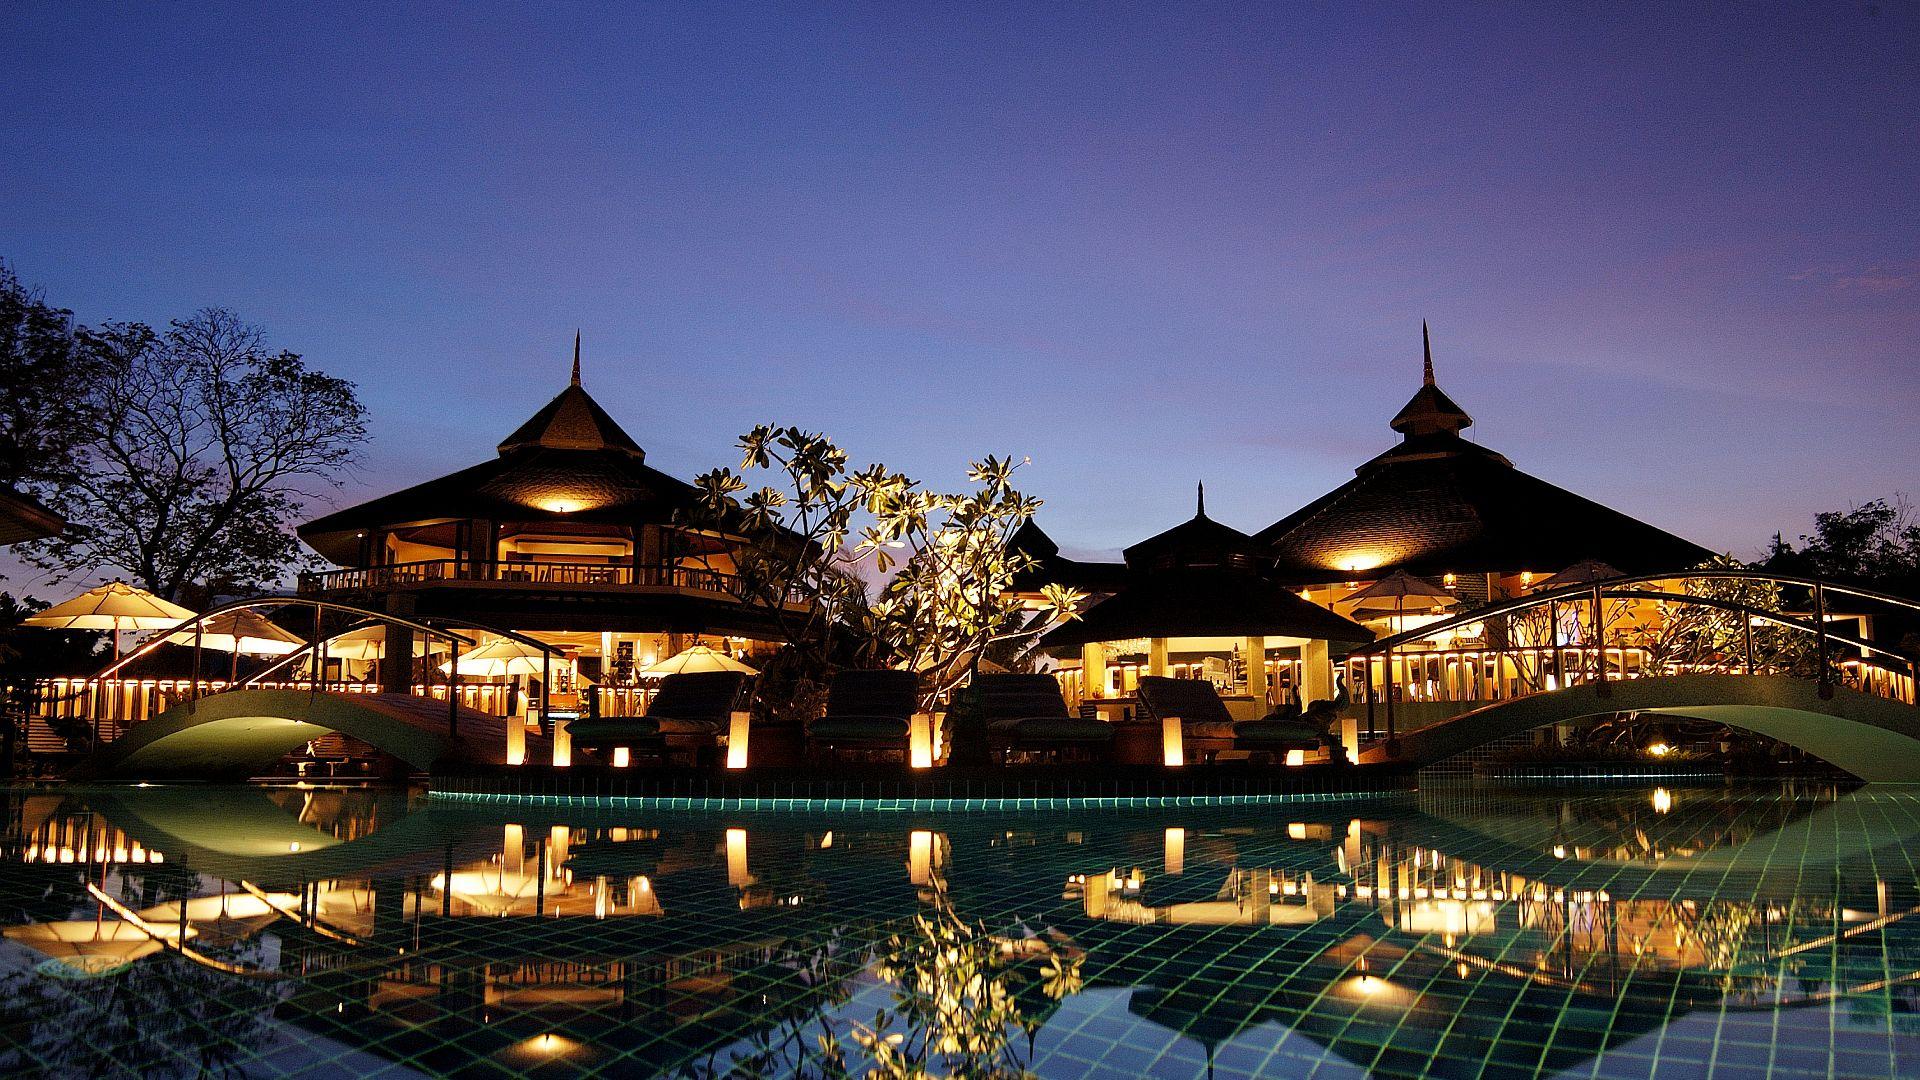 Phuket-Resorts-Mangosteen-Resort-and-Ayurveda-Spa-Reception-and-Restaurant-at-Night